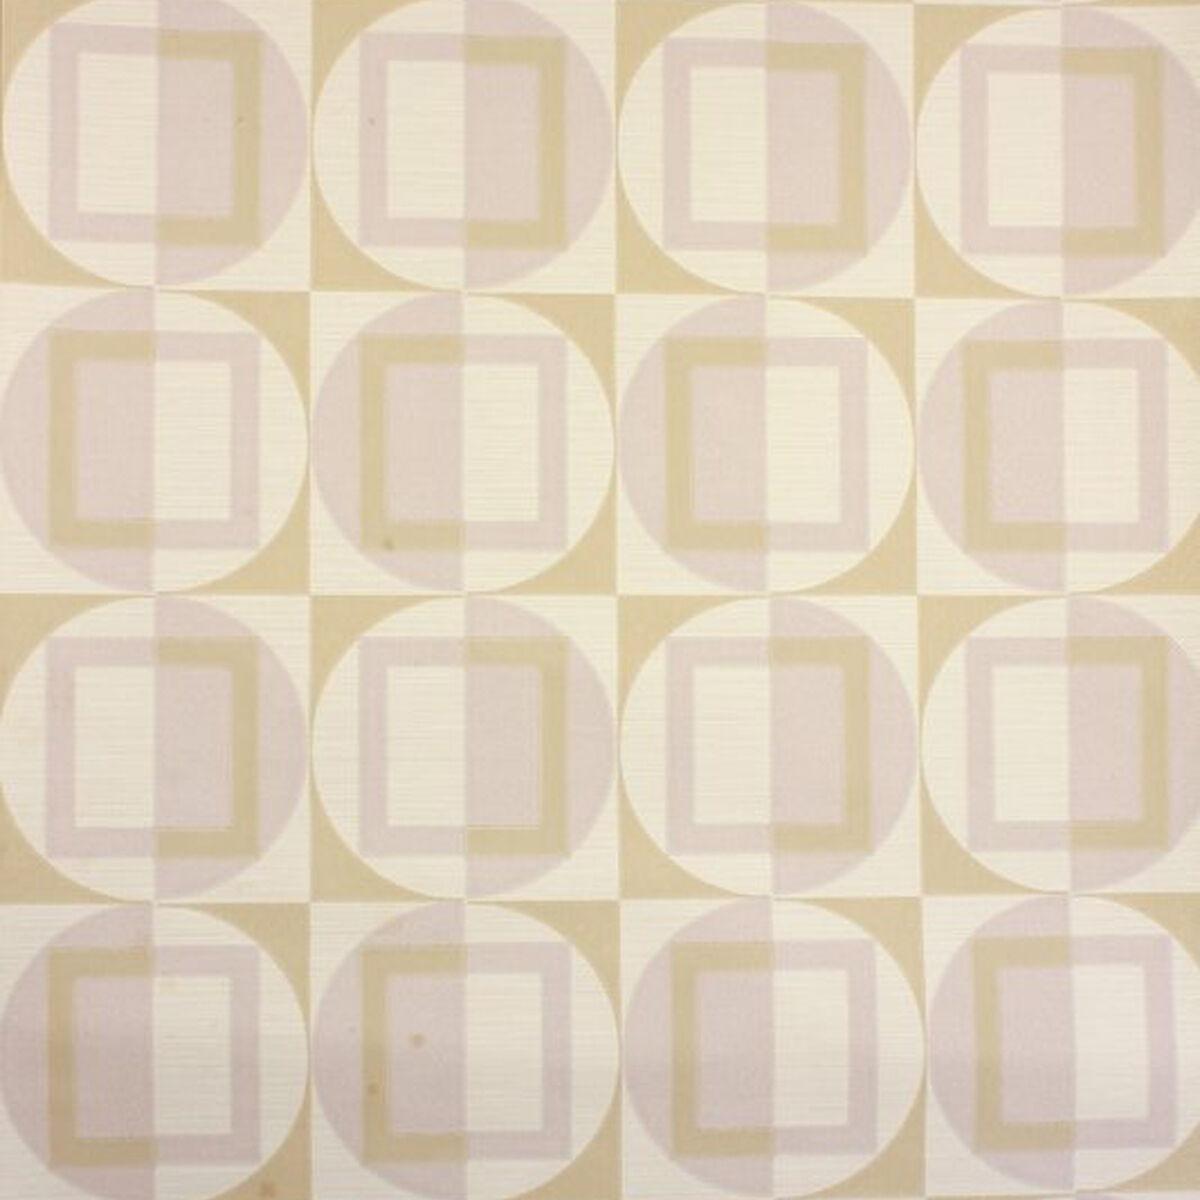 1970s MOD GEOMETRIC Vintage Original 60s 70s Retro Modern Wallpaper